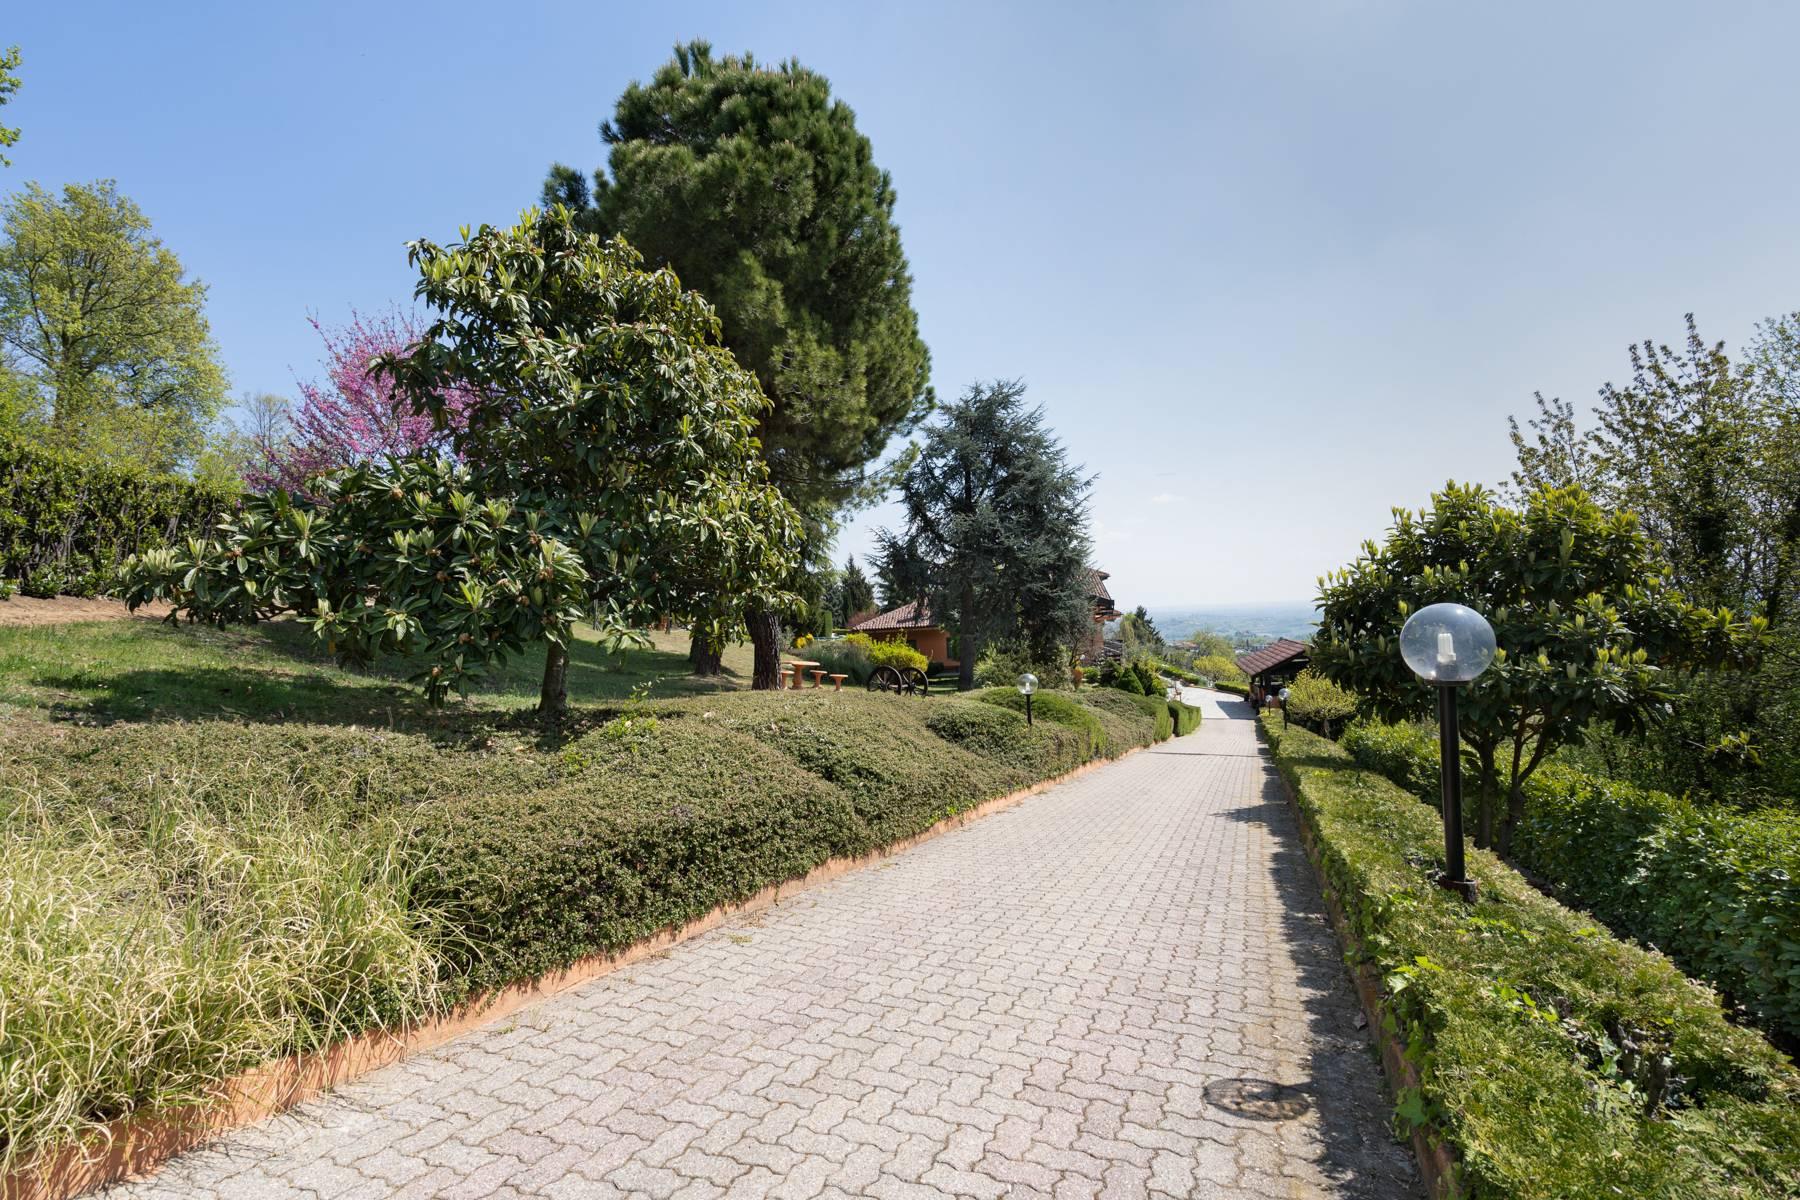 Villa in Vendita a Baldissero Torinese: 5 locali, 503 mq - Foto 2